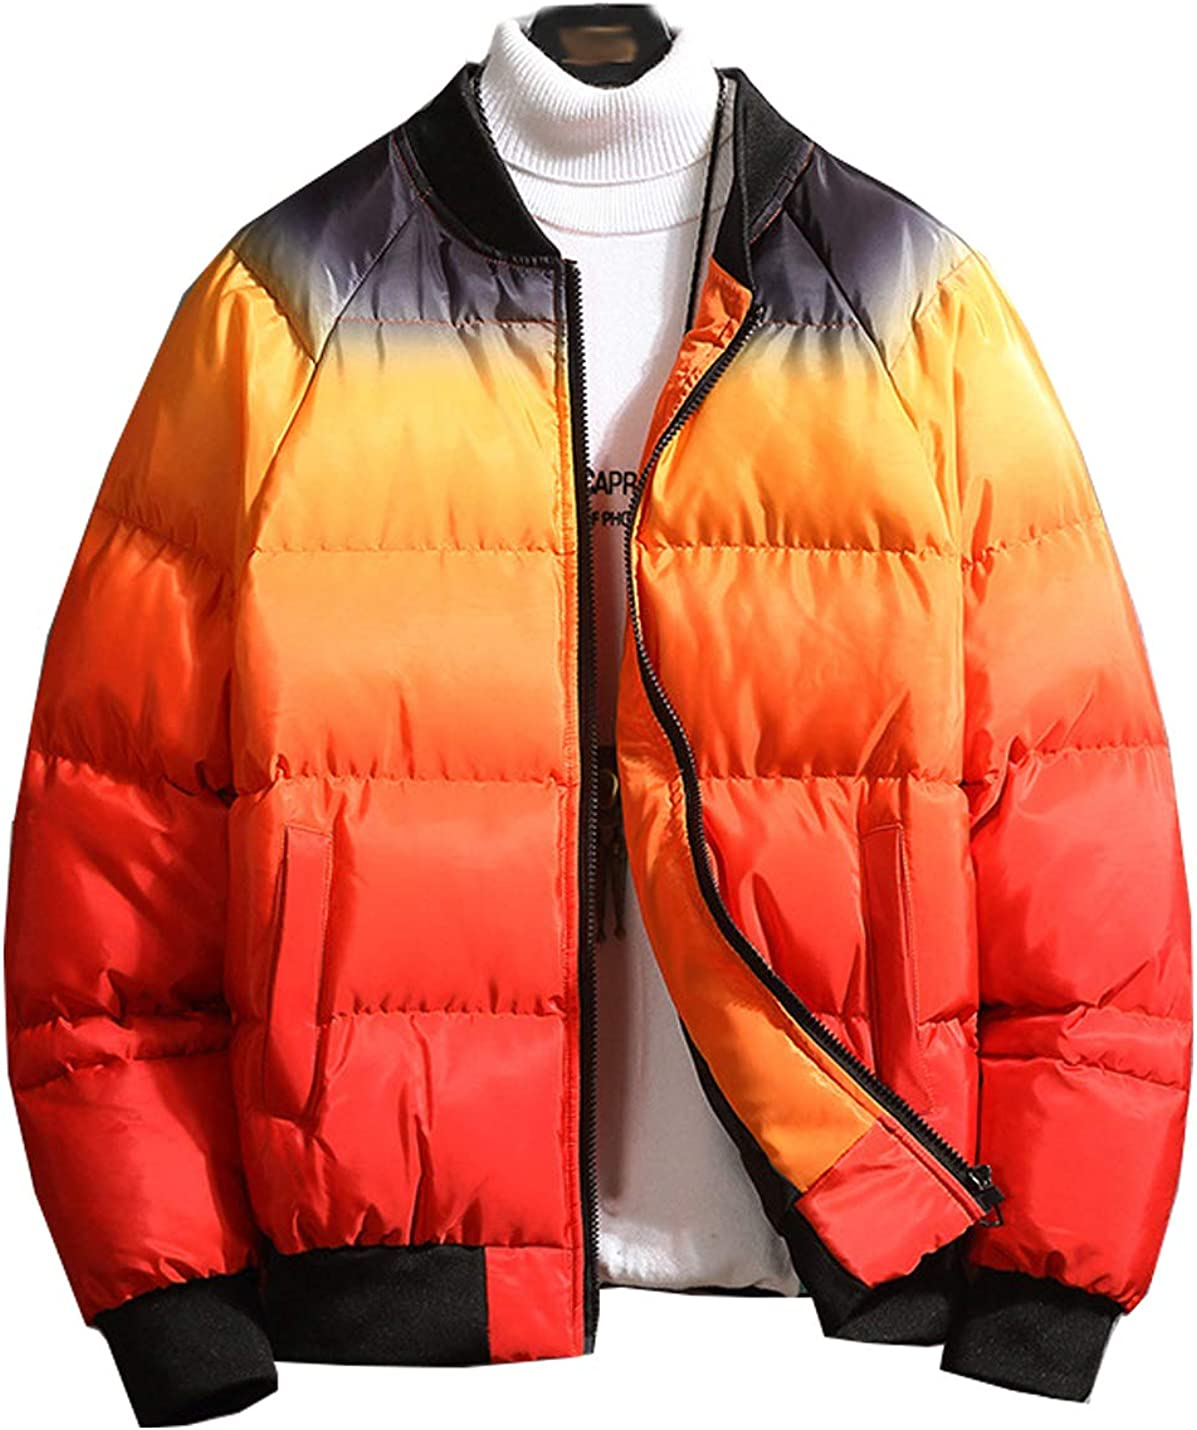 Hongsui Winter Men's Casual Stand-collar Color Block Puffer Jacket Outdoor Full Zipper Down Jacket